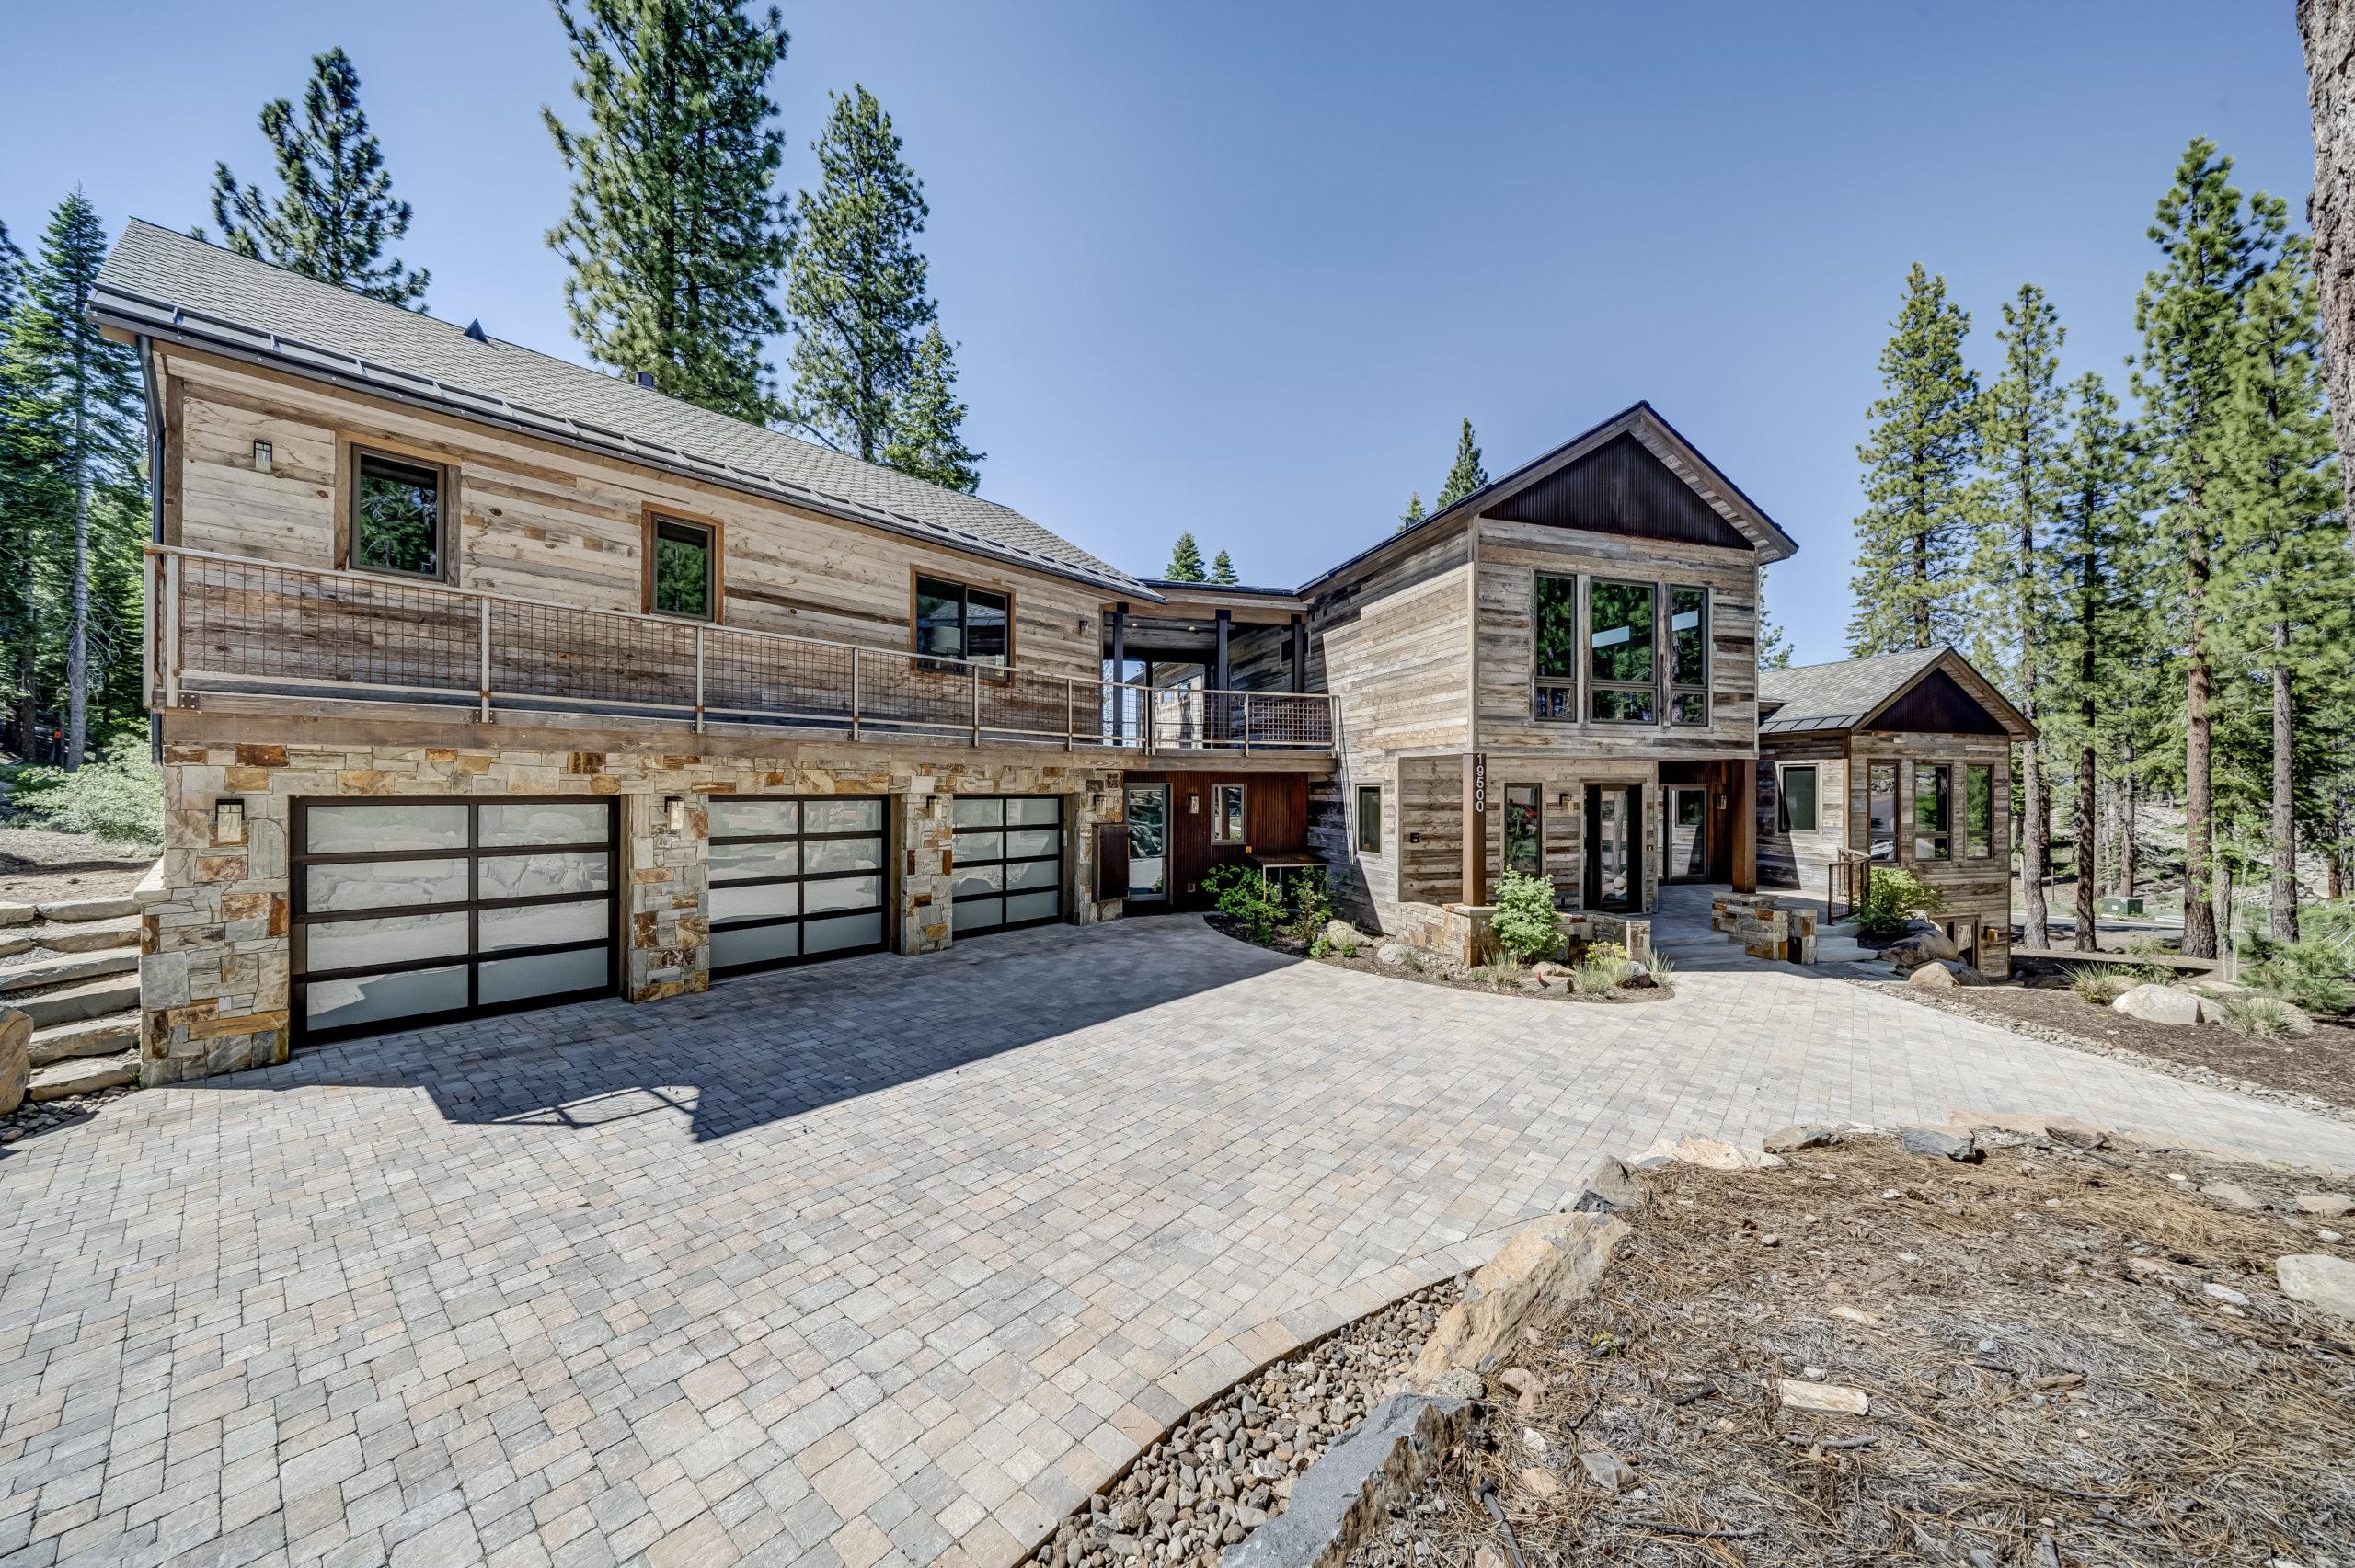 M-12 Home Build Progress – Mountainside at Northstar